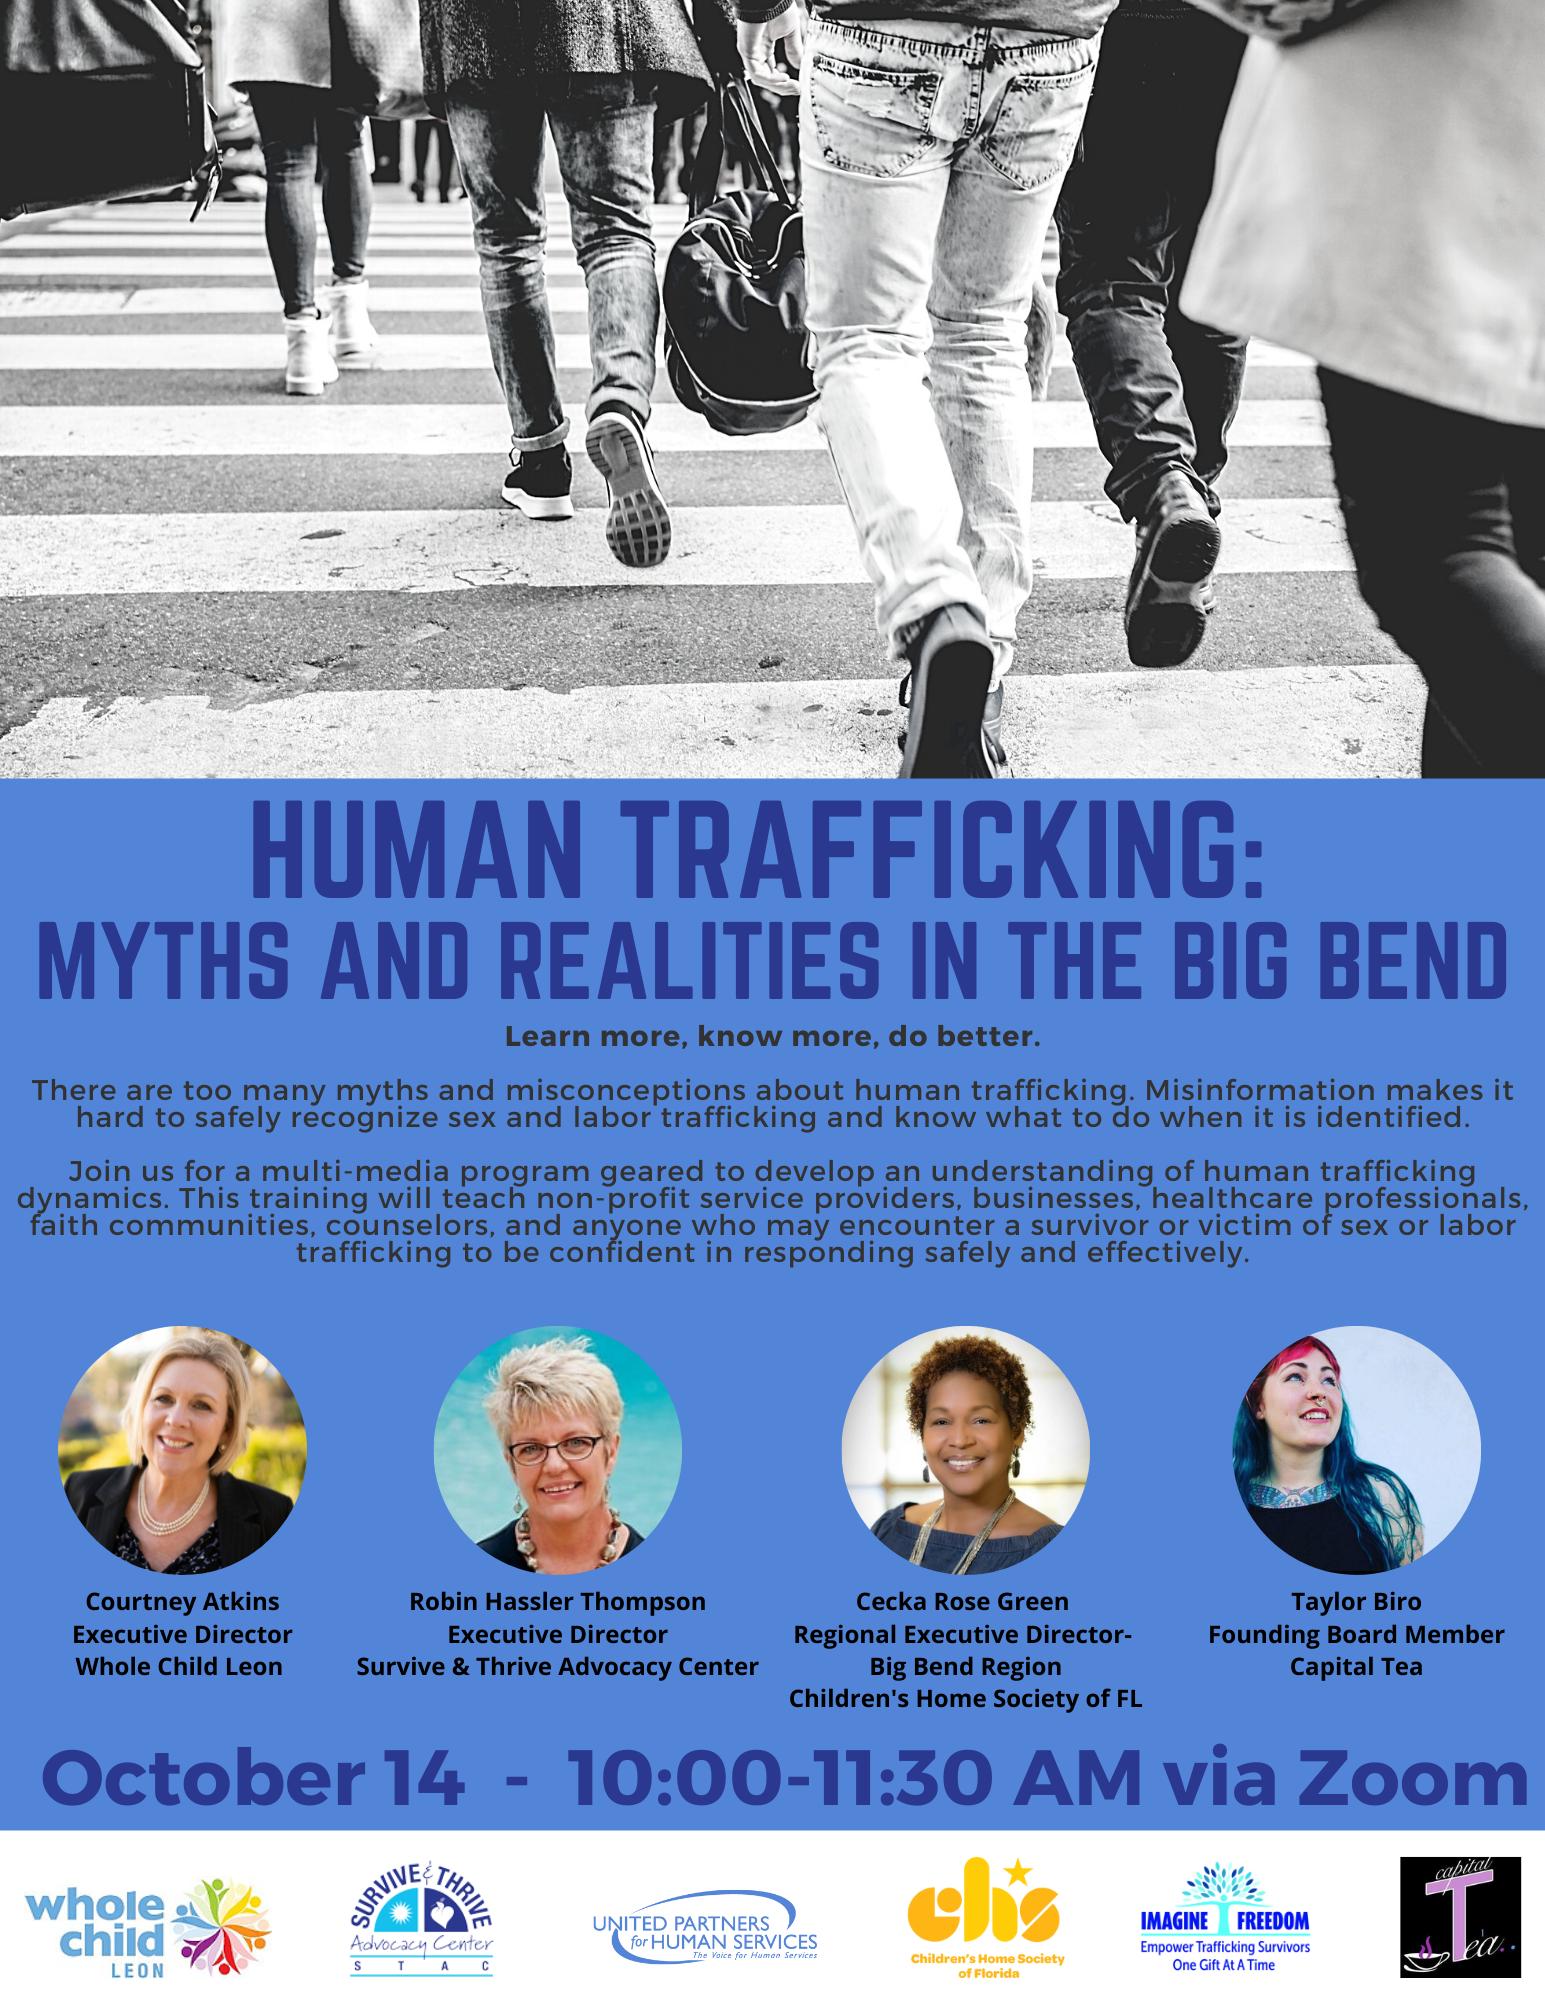 UPHS Human Trafficking Webinar Flier 3